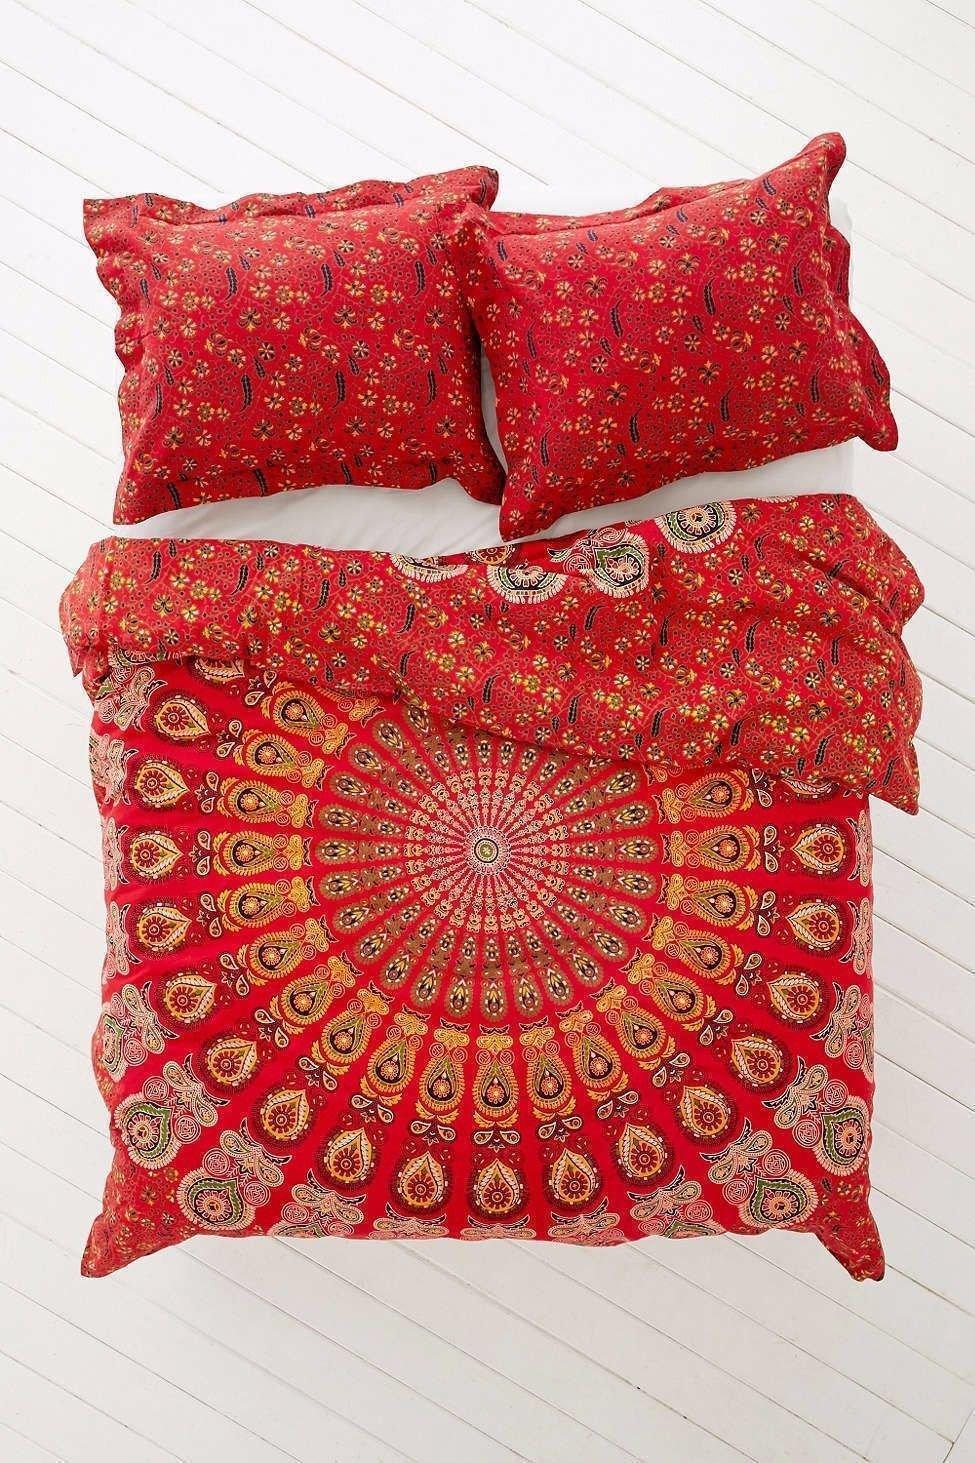 Vedant Designs Indian Peacock Mandala Queen Size Comforter Hippie Boho Cotton Doona Duvet Cover Comforter Mandala Hippie Bohemian Quilt Cover Set By